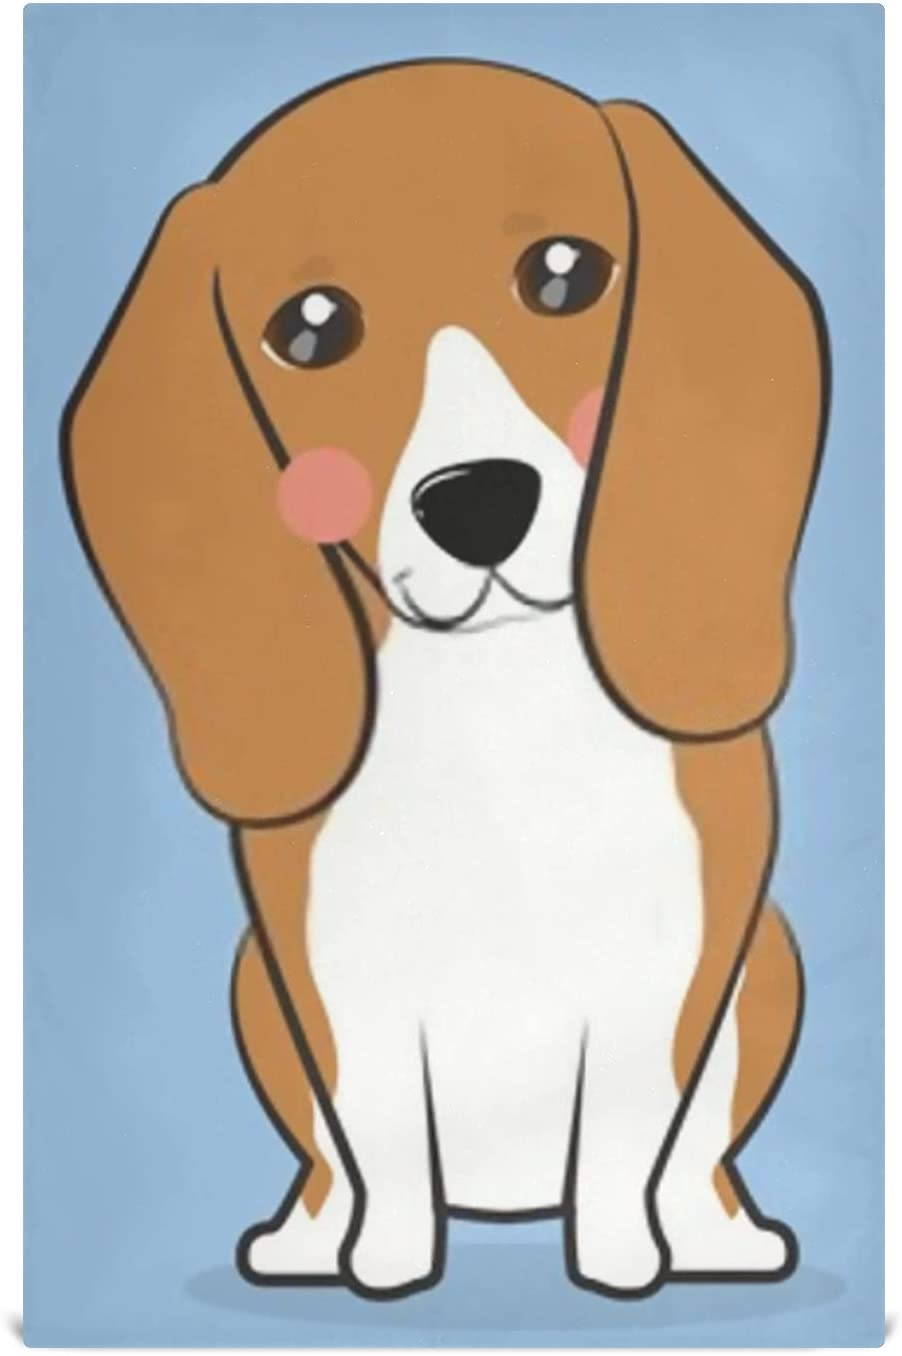 JIUCHUAN Kitchen Dish Towel Set 1 year warranty 6 Oakland Mall Dogs Cute Beagle Cartoon Style